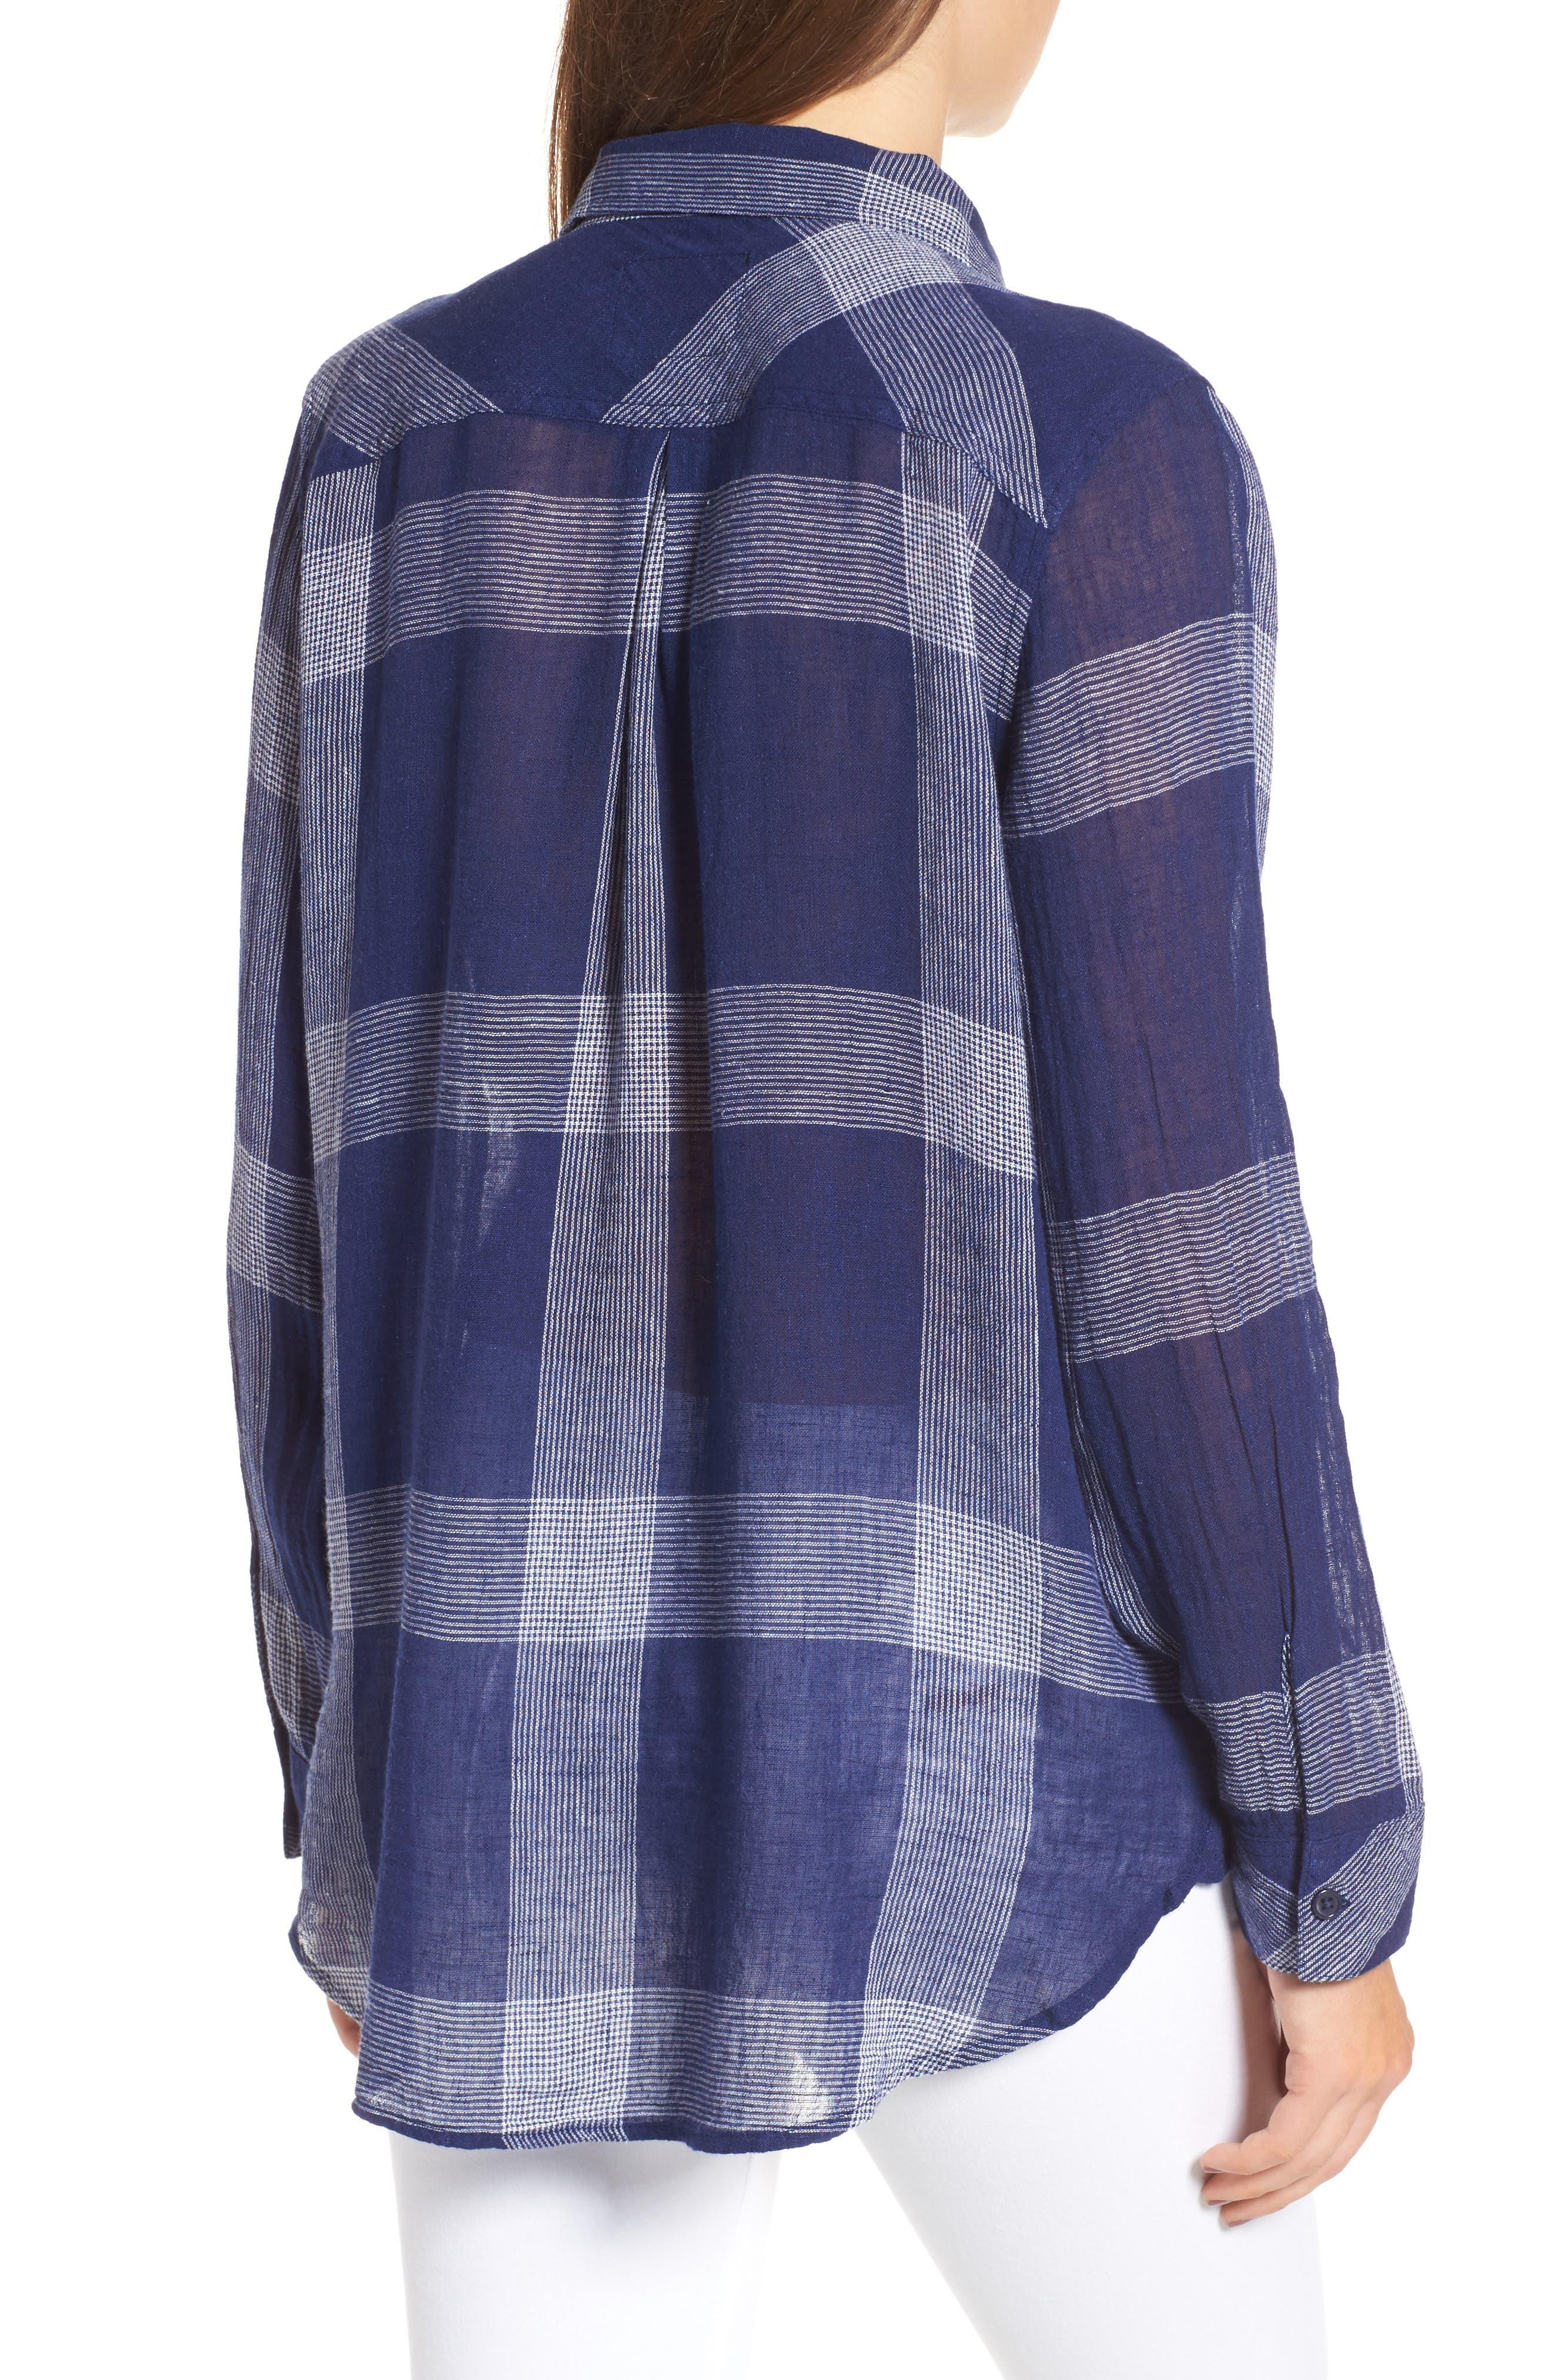 Charli Plaid Shirt,                             Alternate thumbnail 2, color,                             Patriot/ White